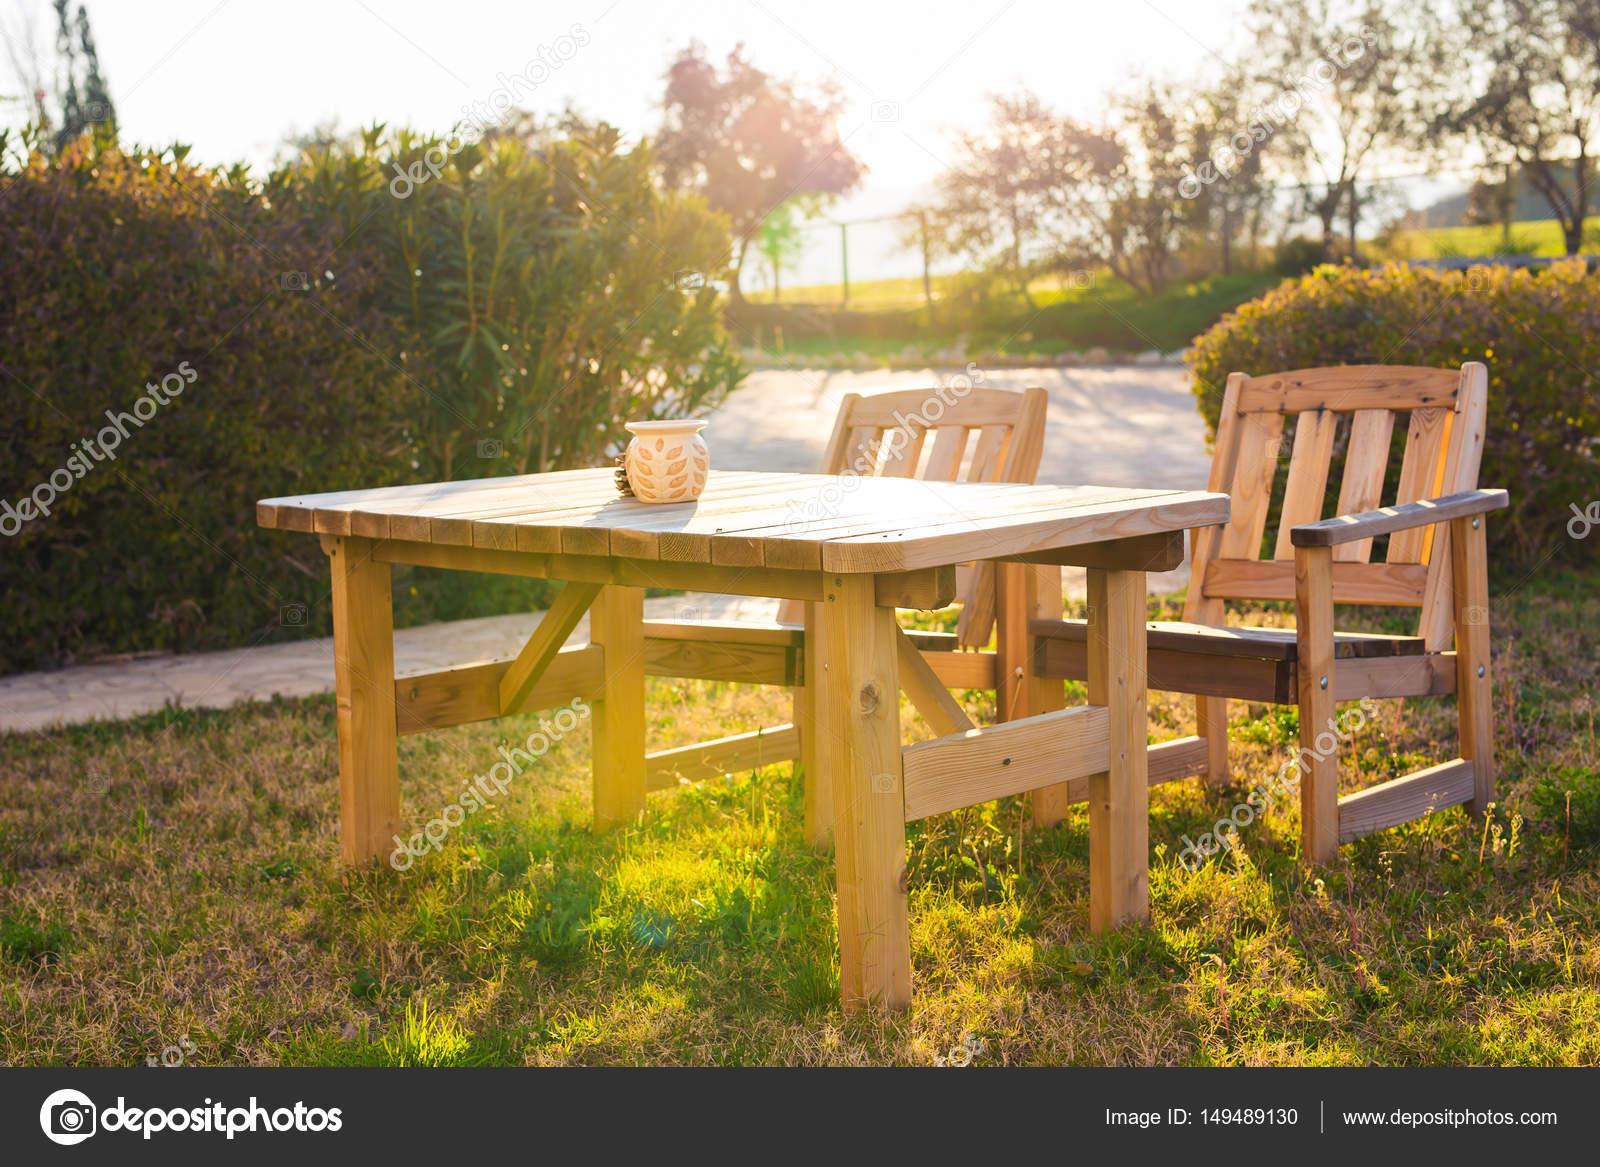 Tuin Lounge Stoel : Witte tuinmeubilair lounge stoelen in de tuin van het hotel